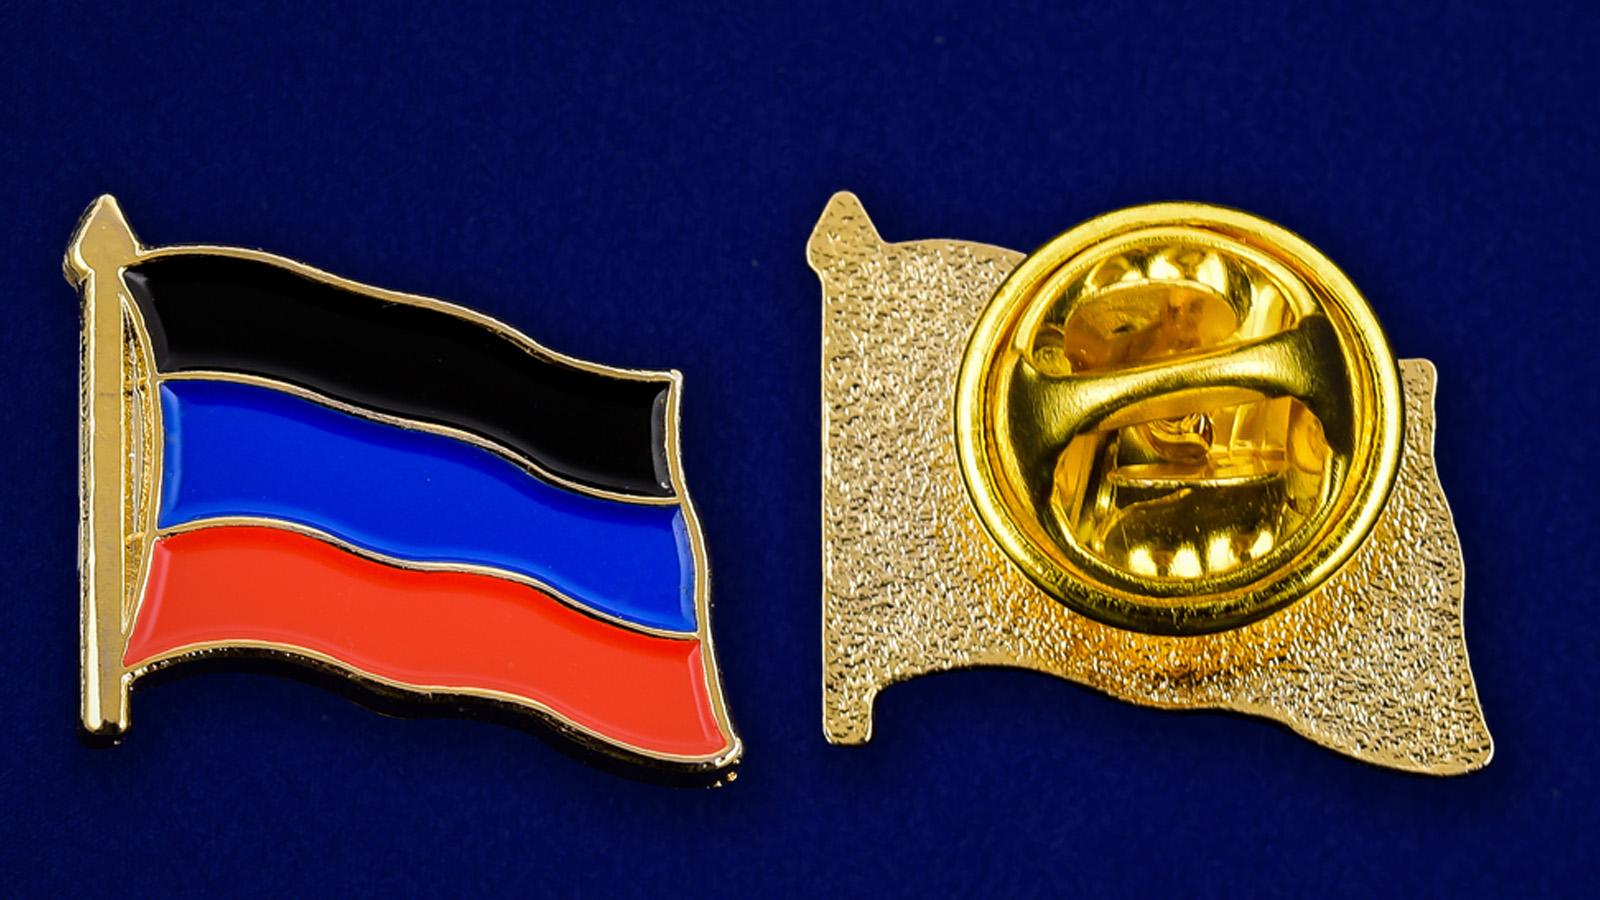 Значок ДНР аверс и реверс